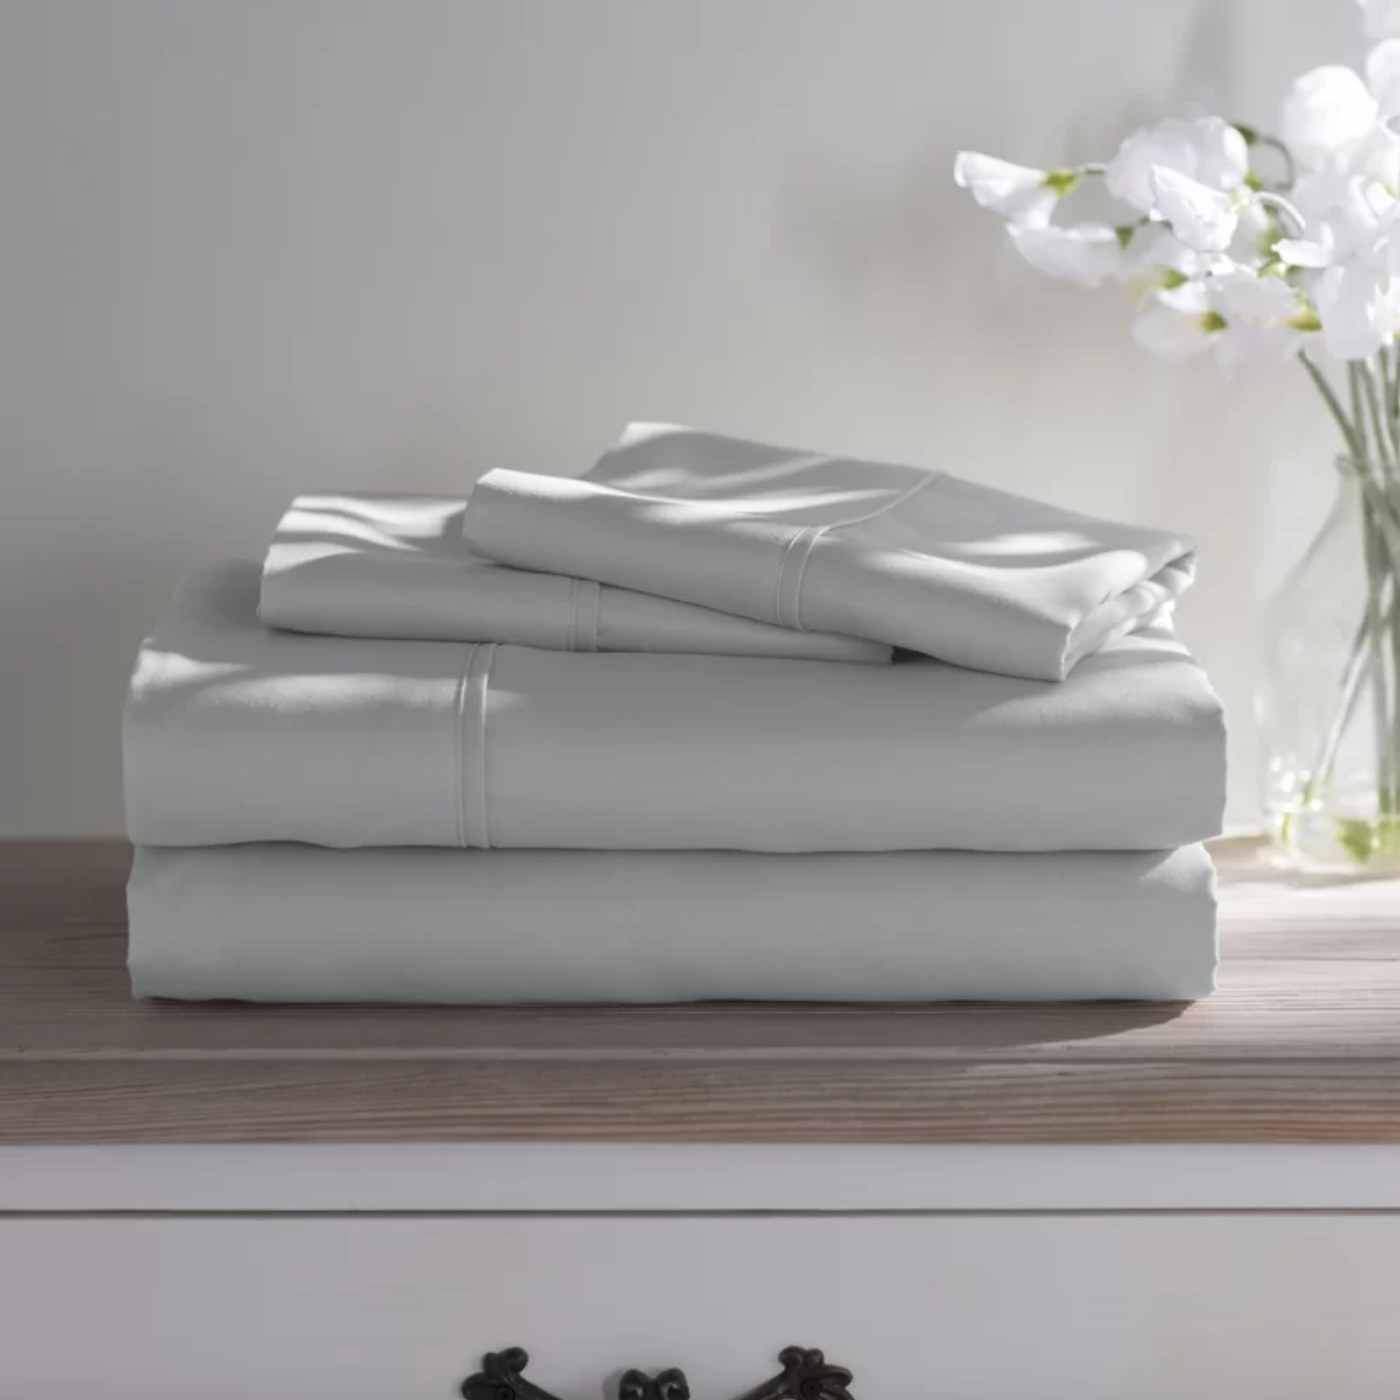 The sheet set in light gray